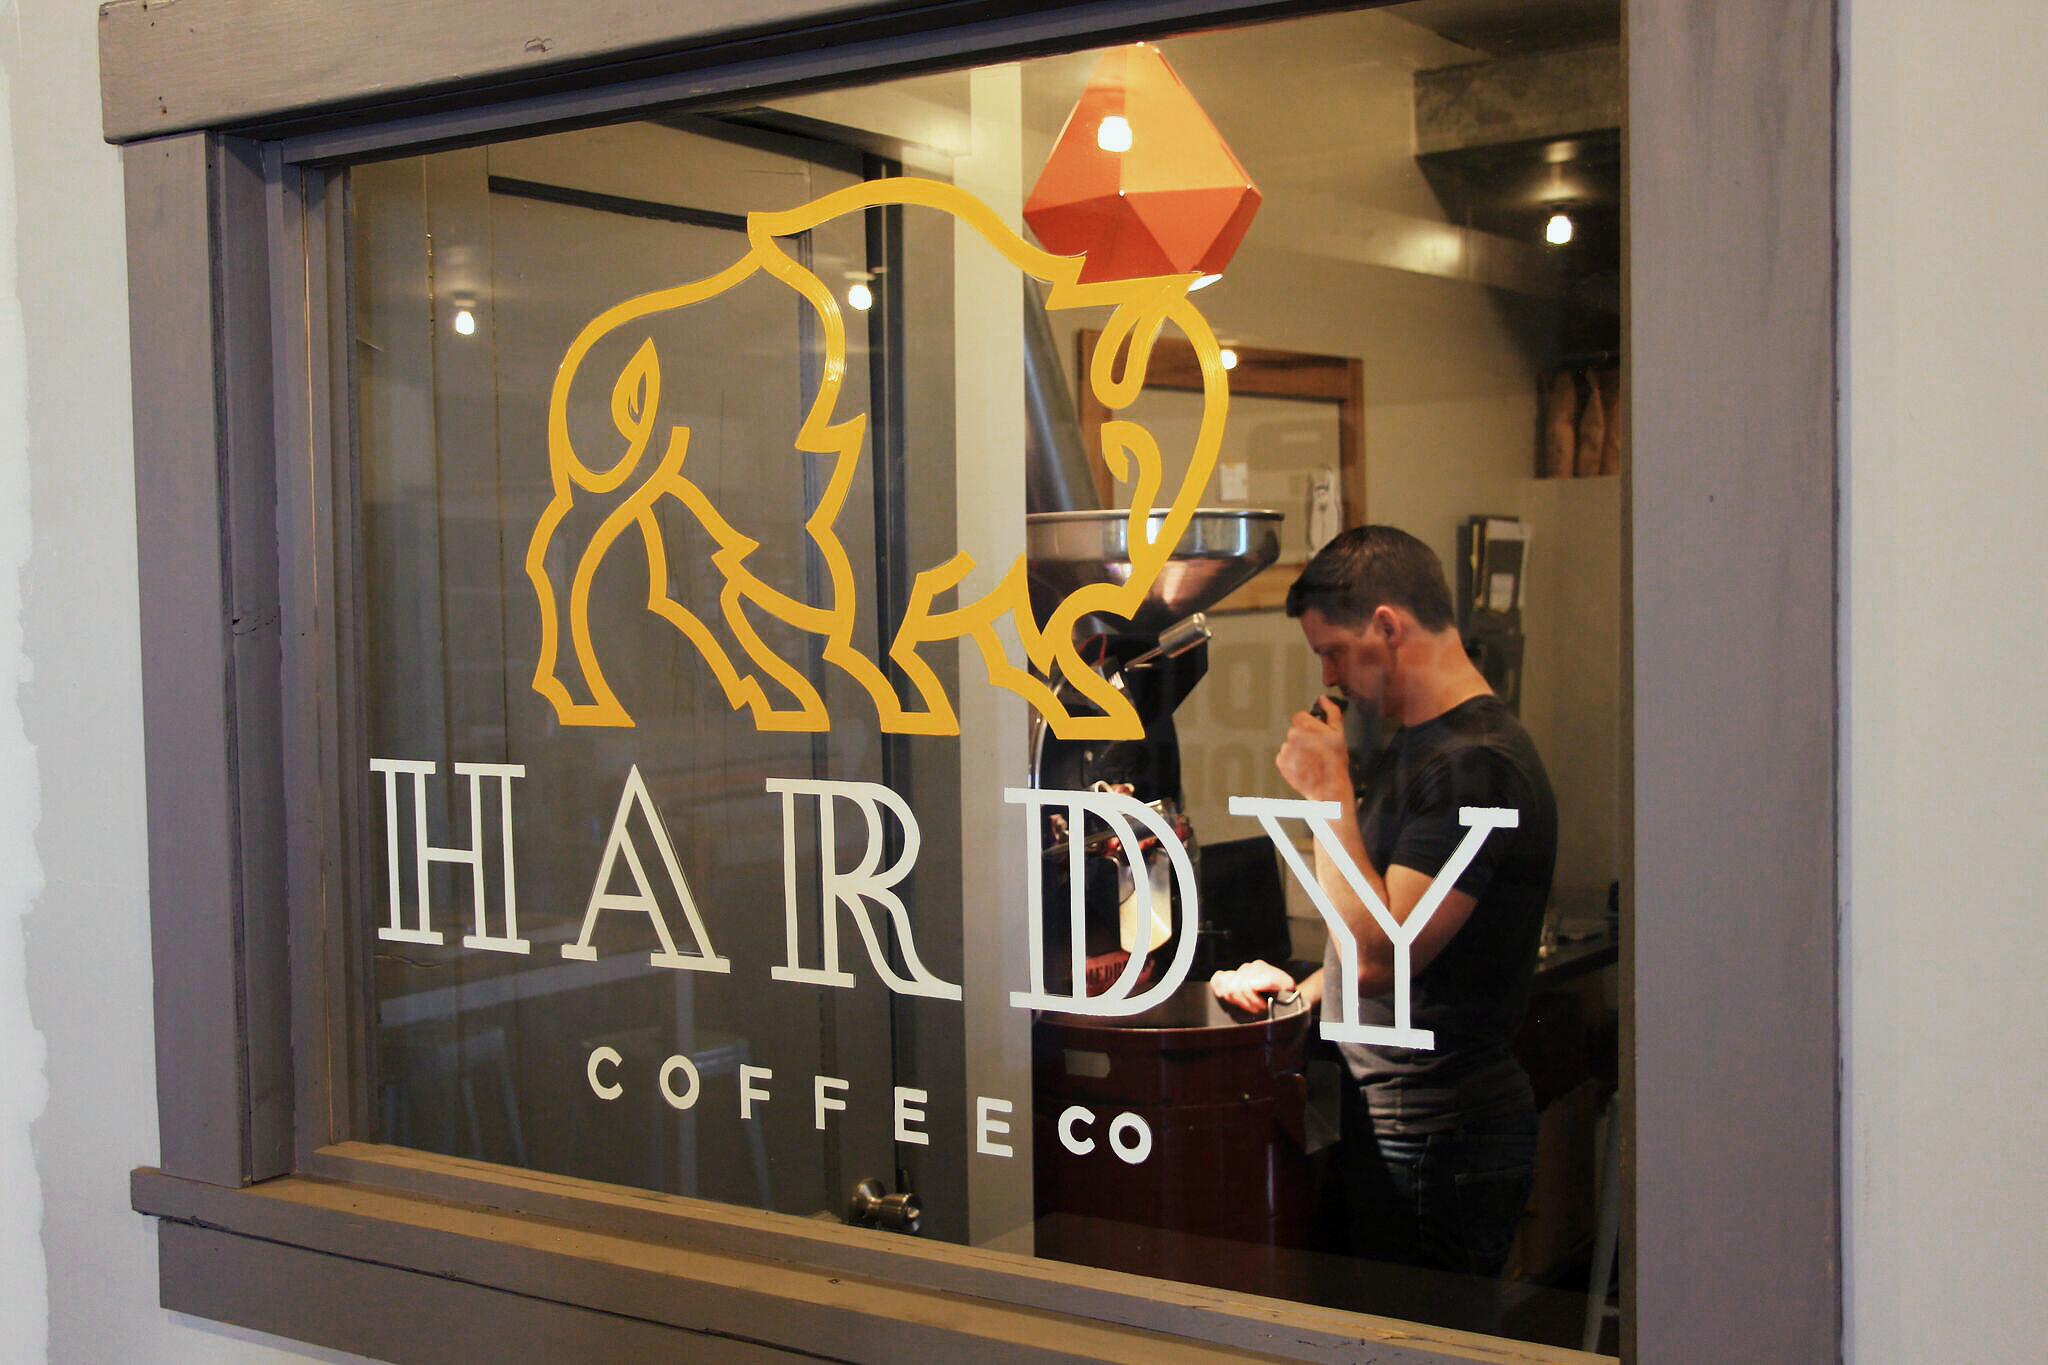 Hardy Coffee Co head roaster, Nick Tabor